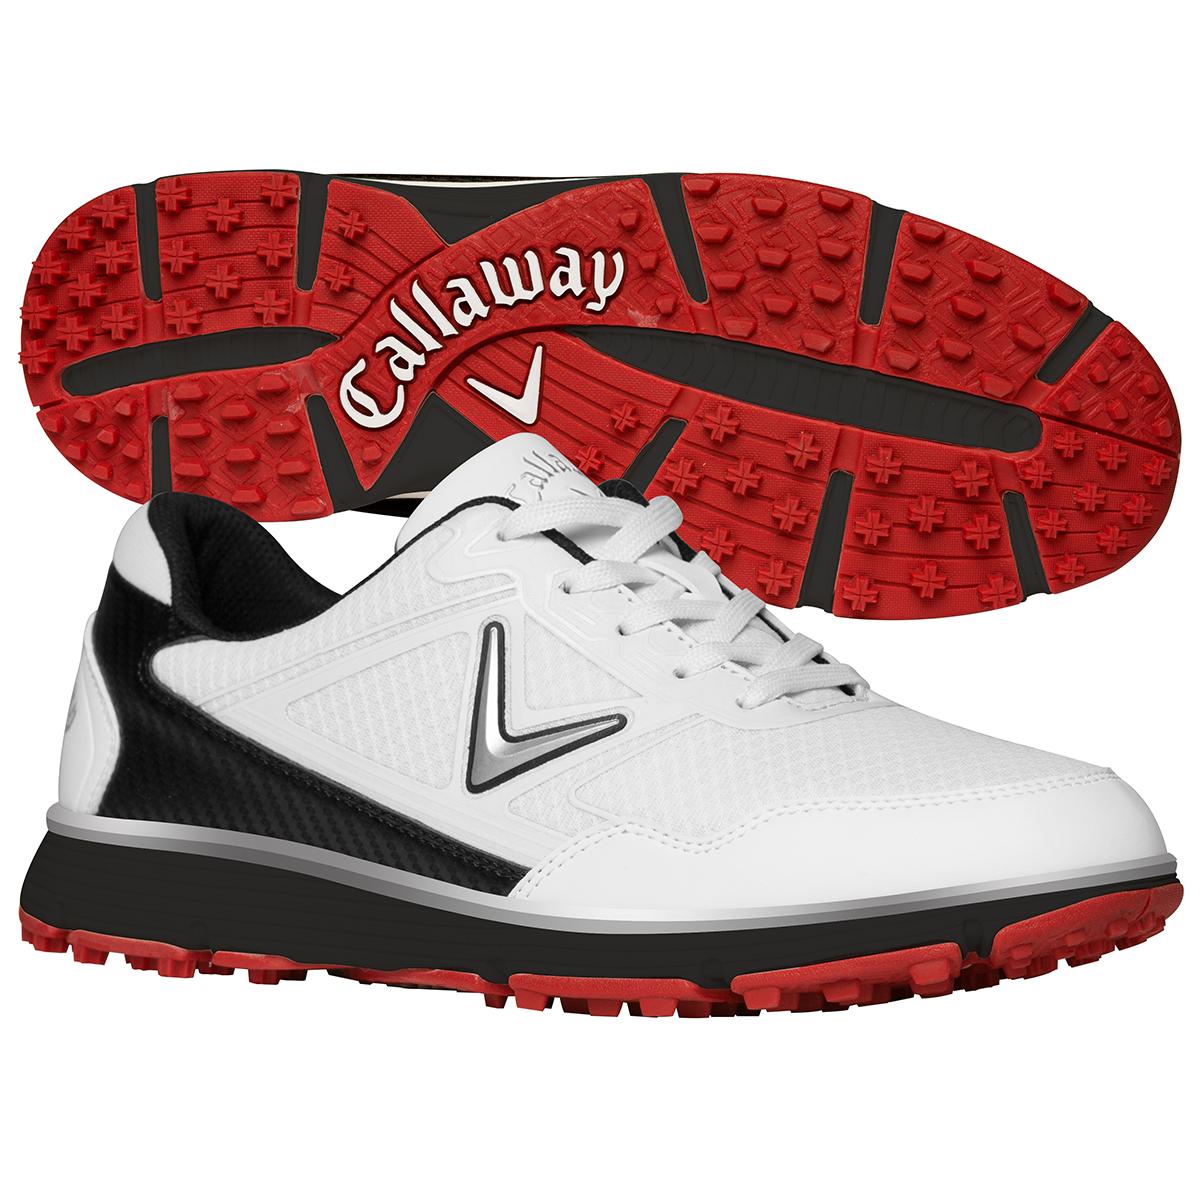 57d2b193f86d3 Callaway Men's Balboa Vent Golf Shoes White/Black 12 W 889993068415 ...